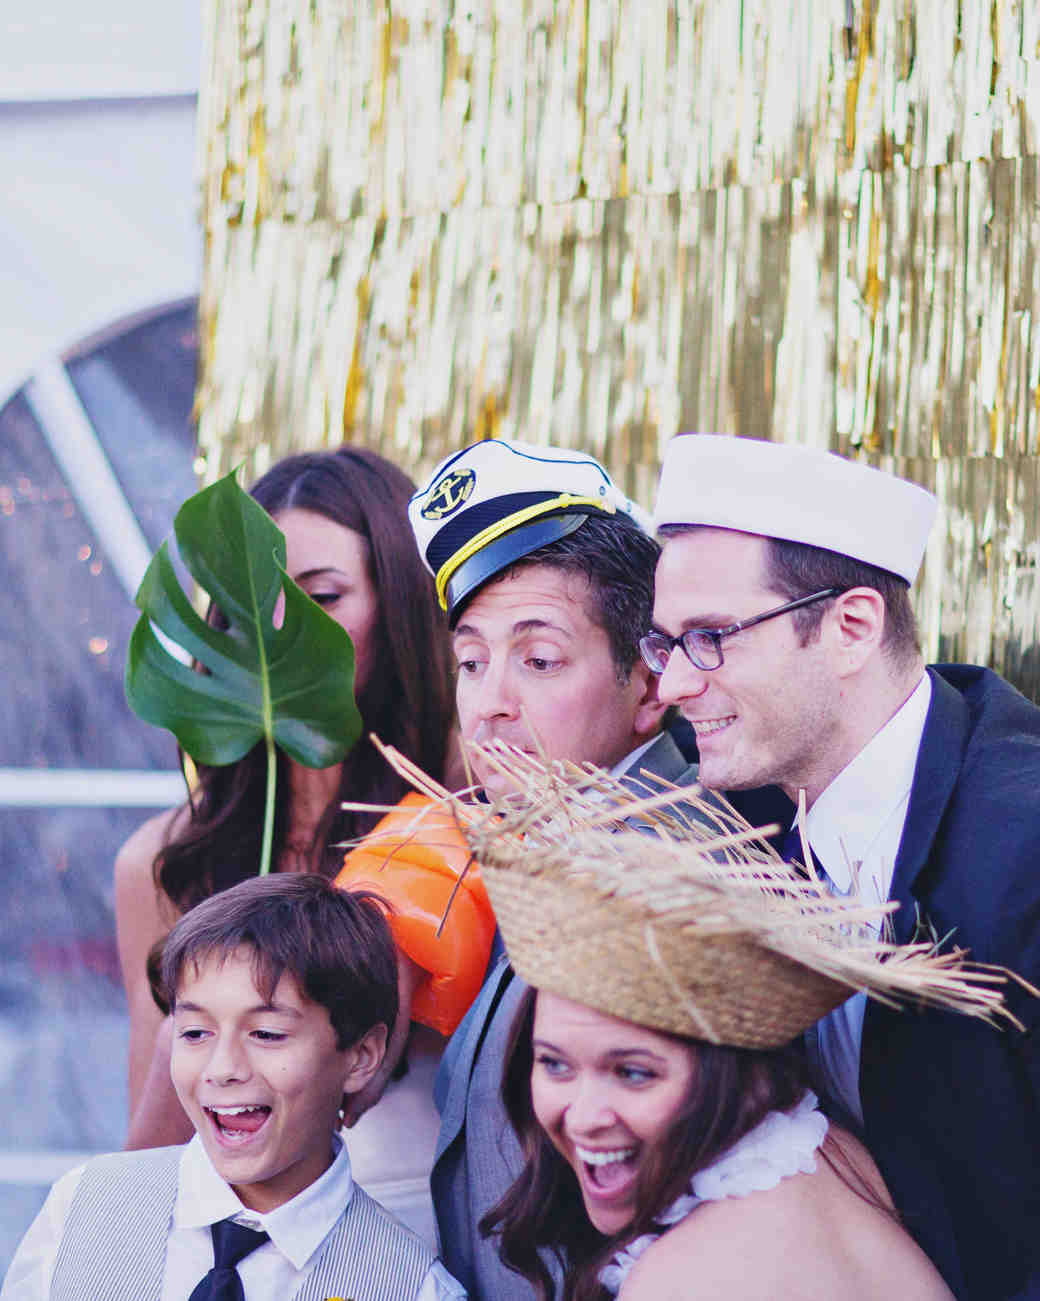 casey-ross-wedding-photobooth-775-s111514-1114.jpg